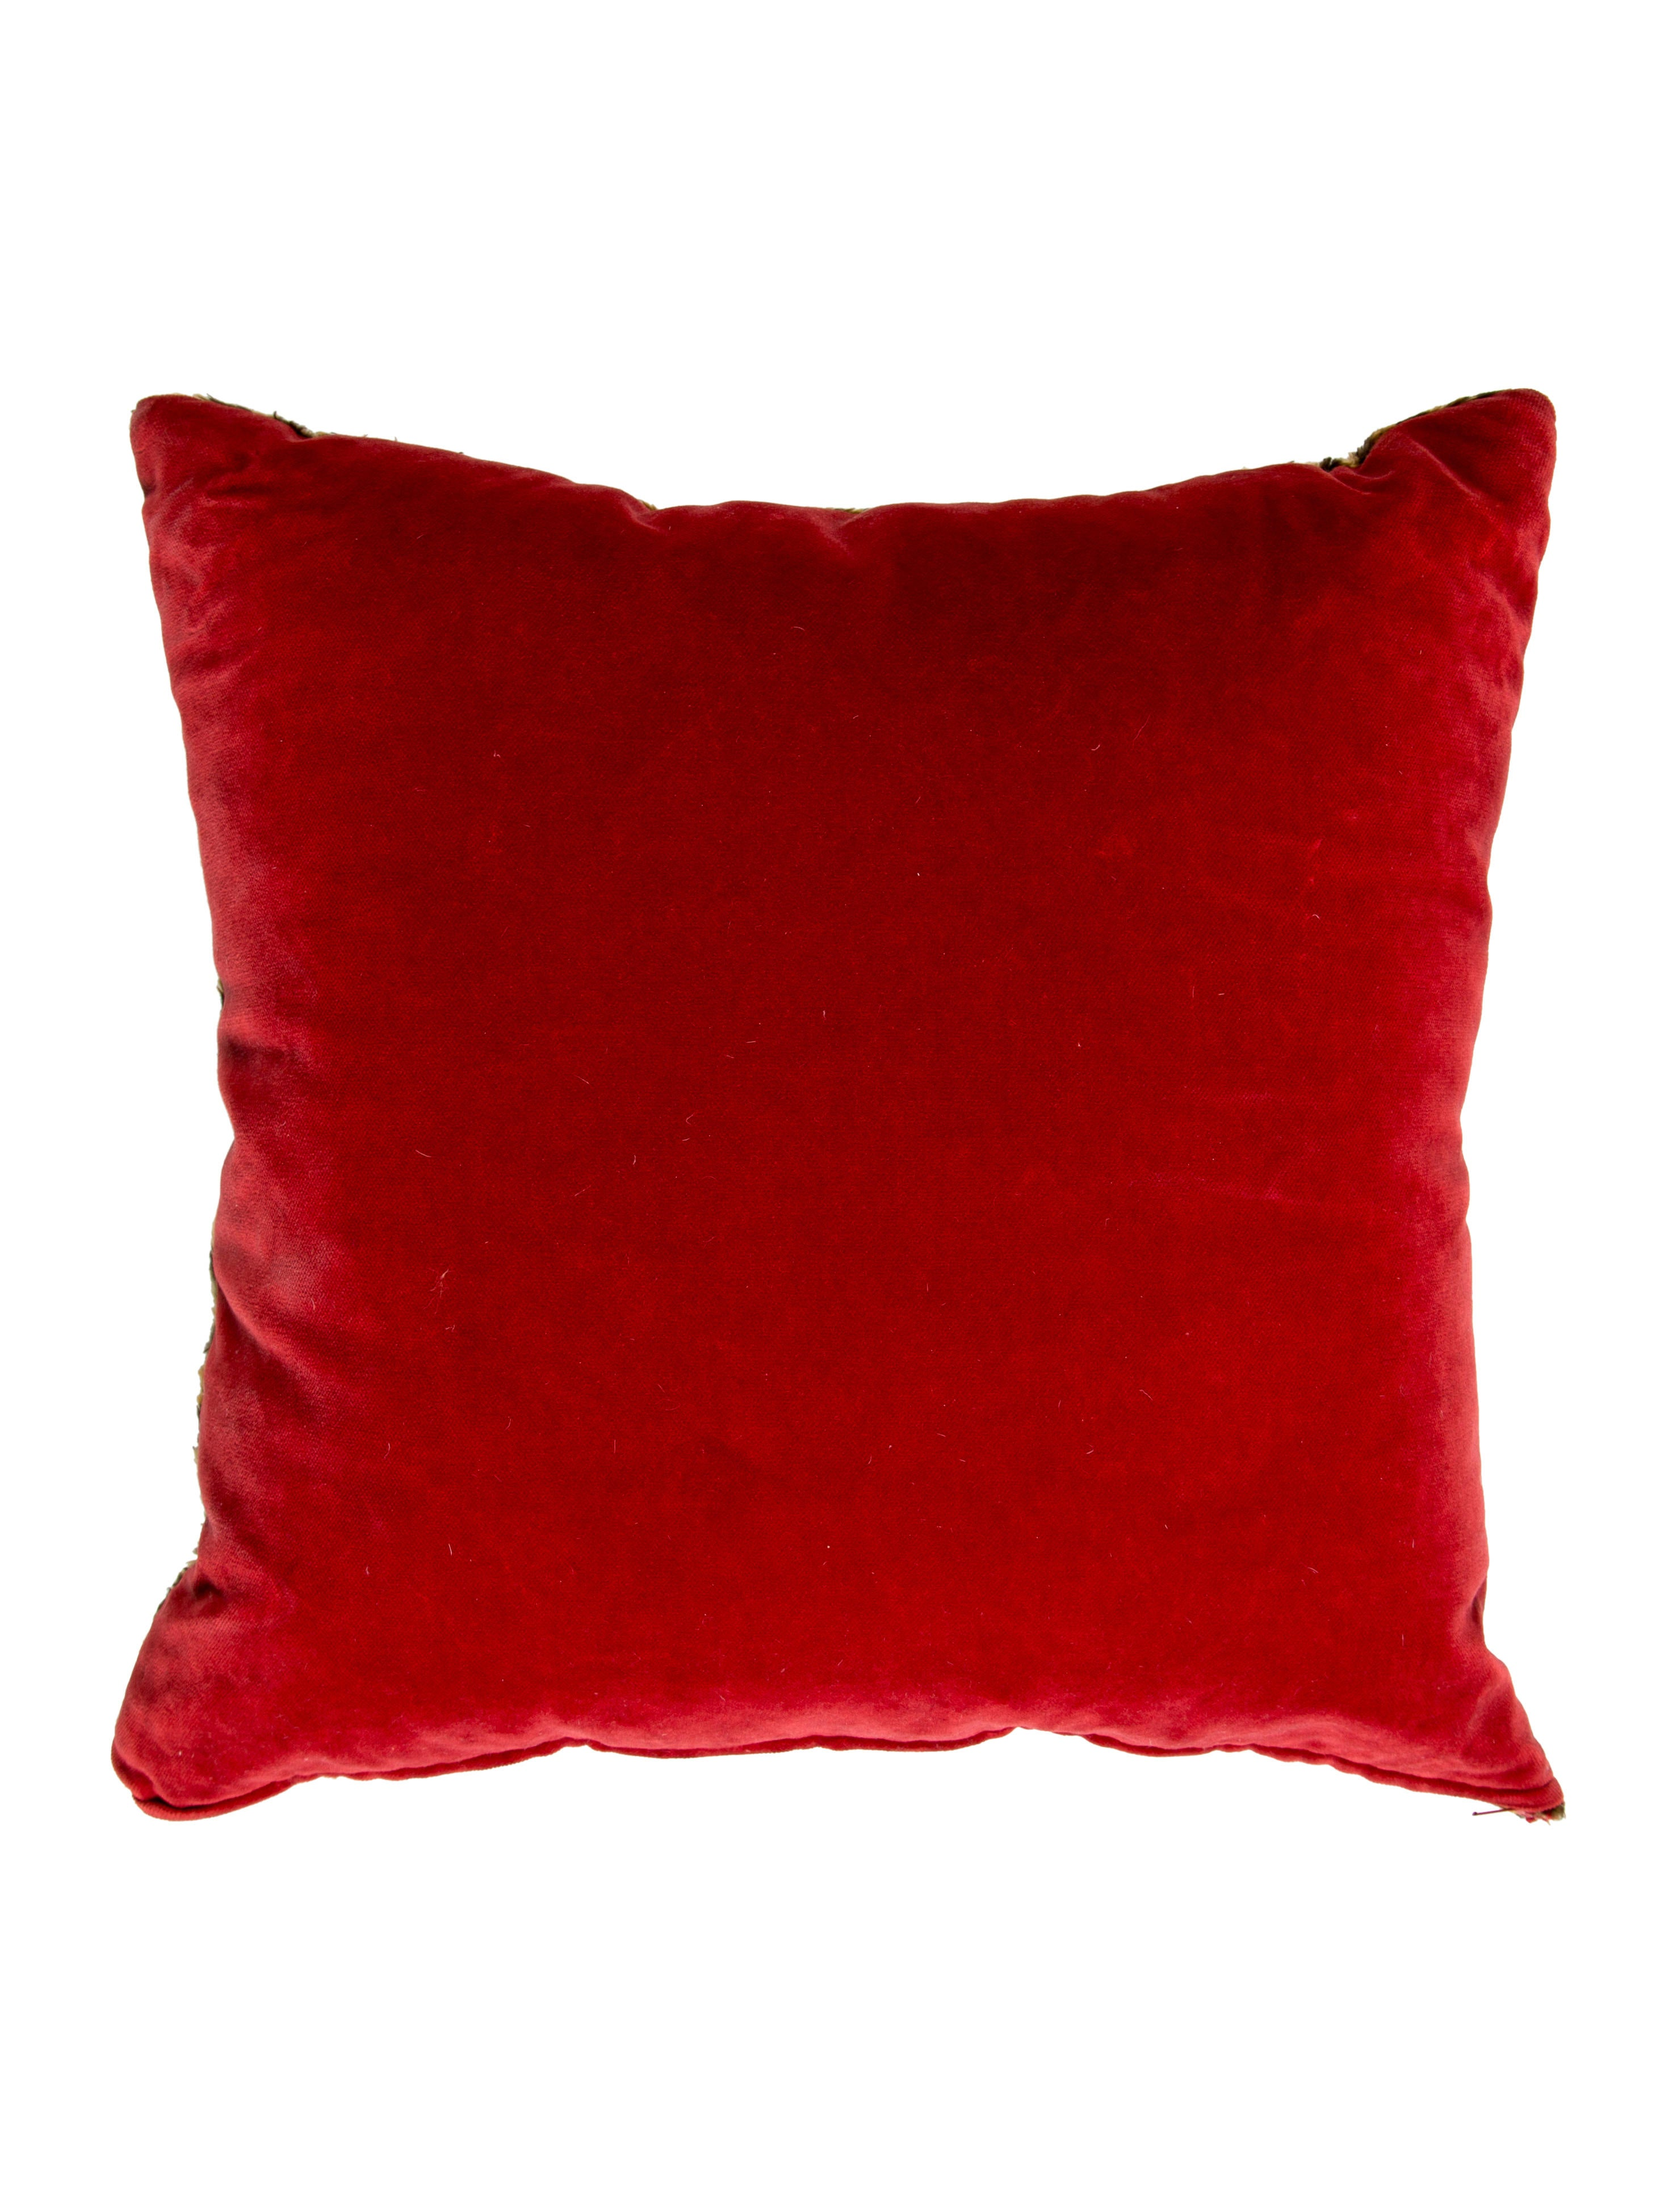 Ralph Lauren Aragon Leopard Throw Pillow - Bedding And Bath - WYG21991 The RealReal